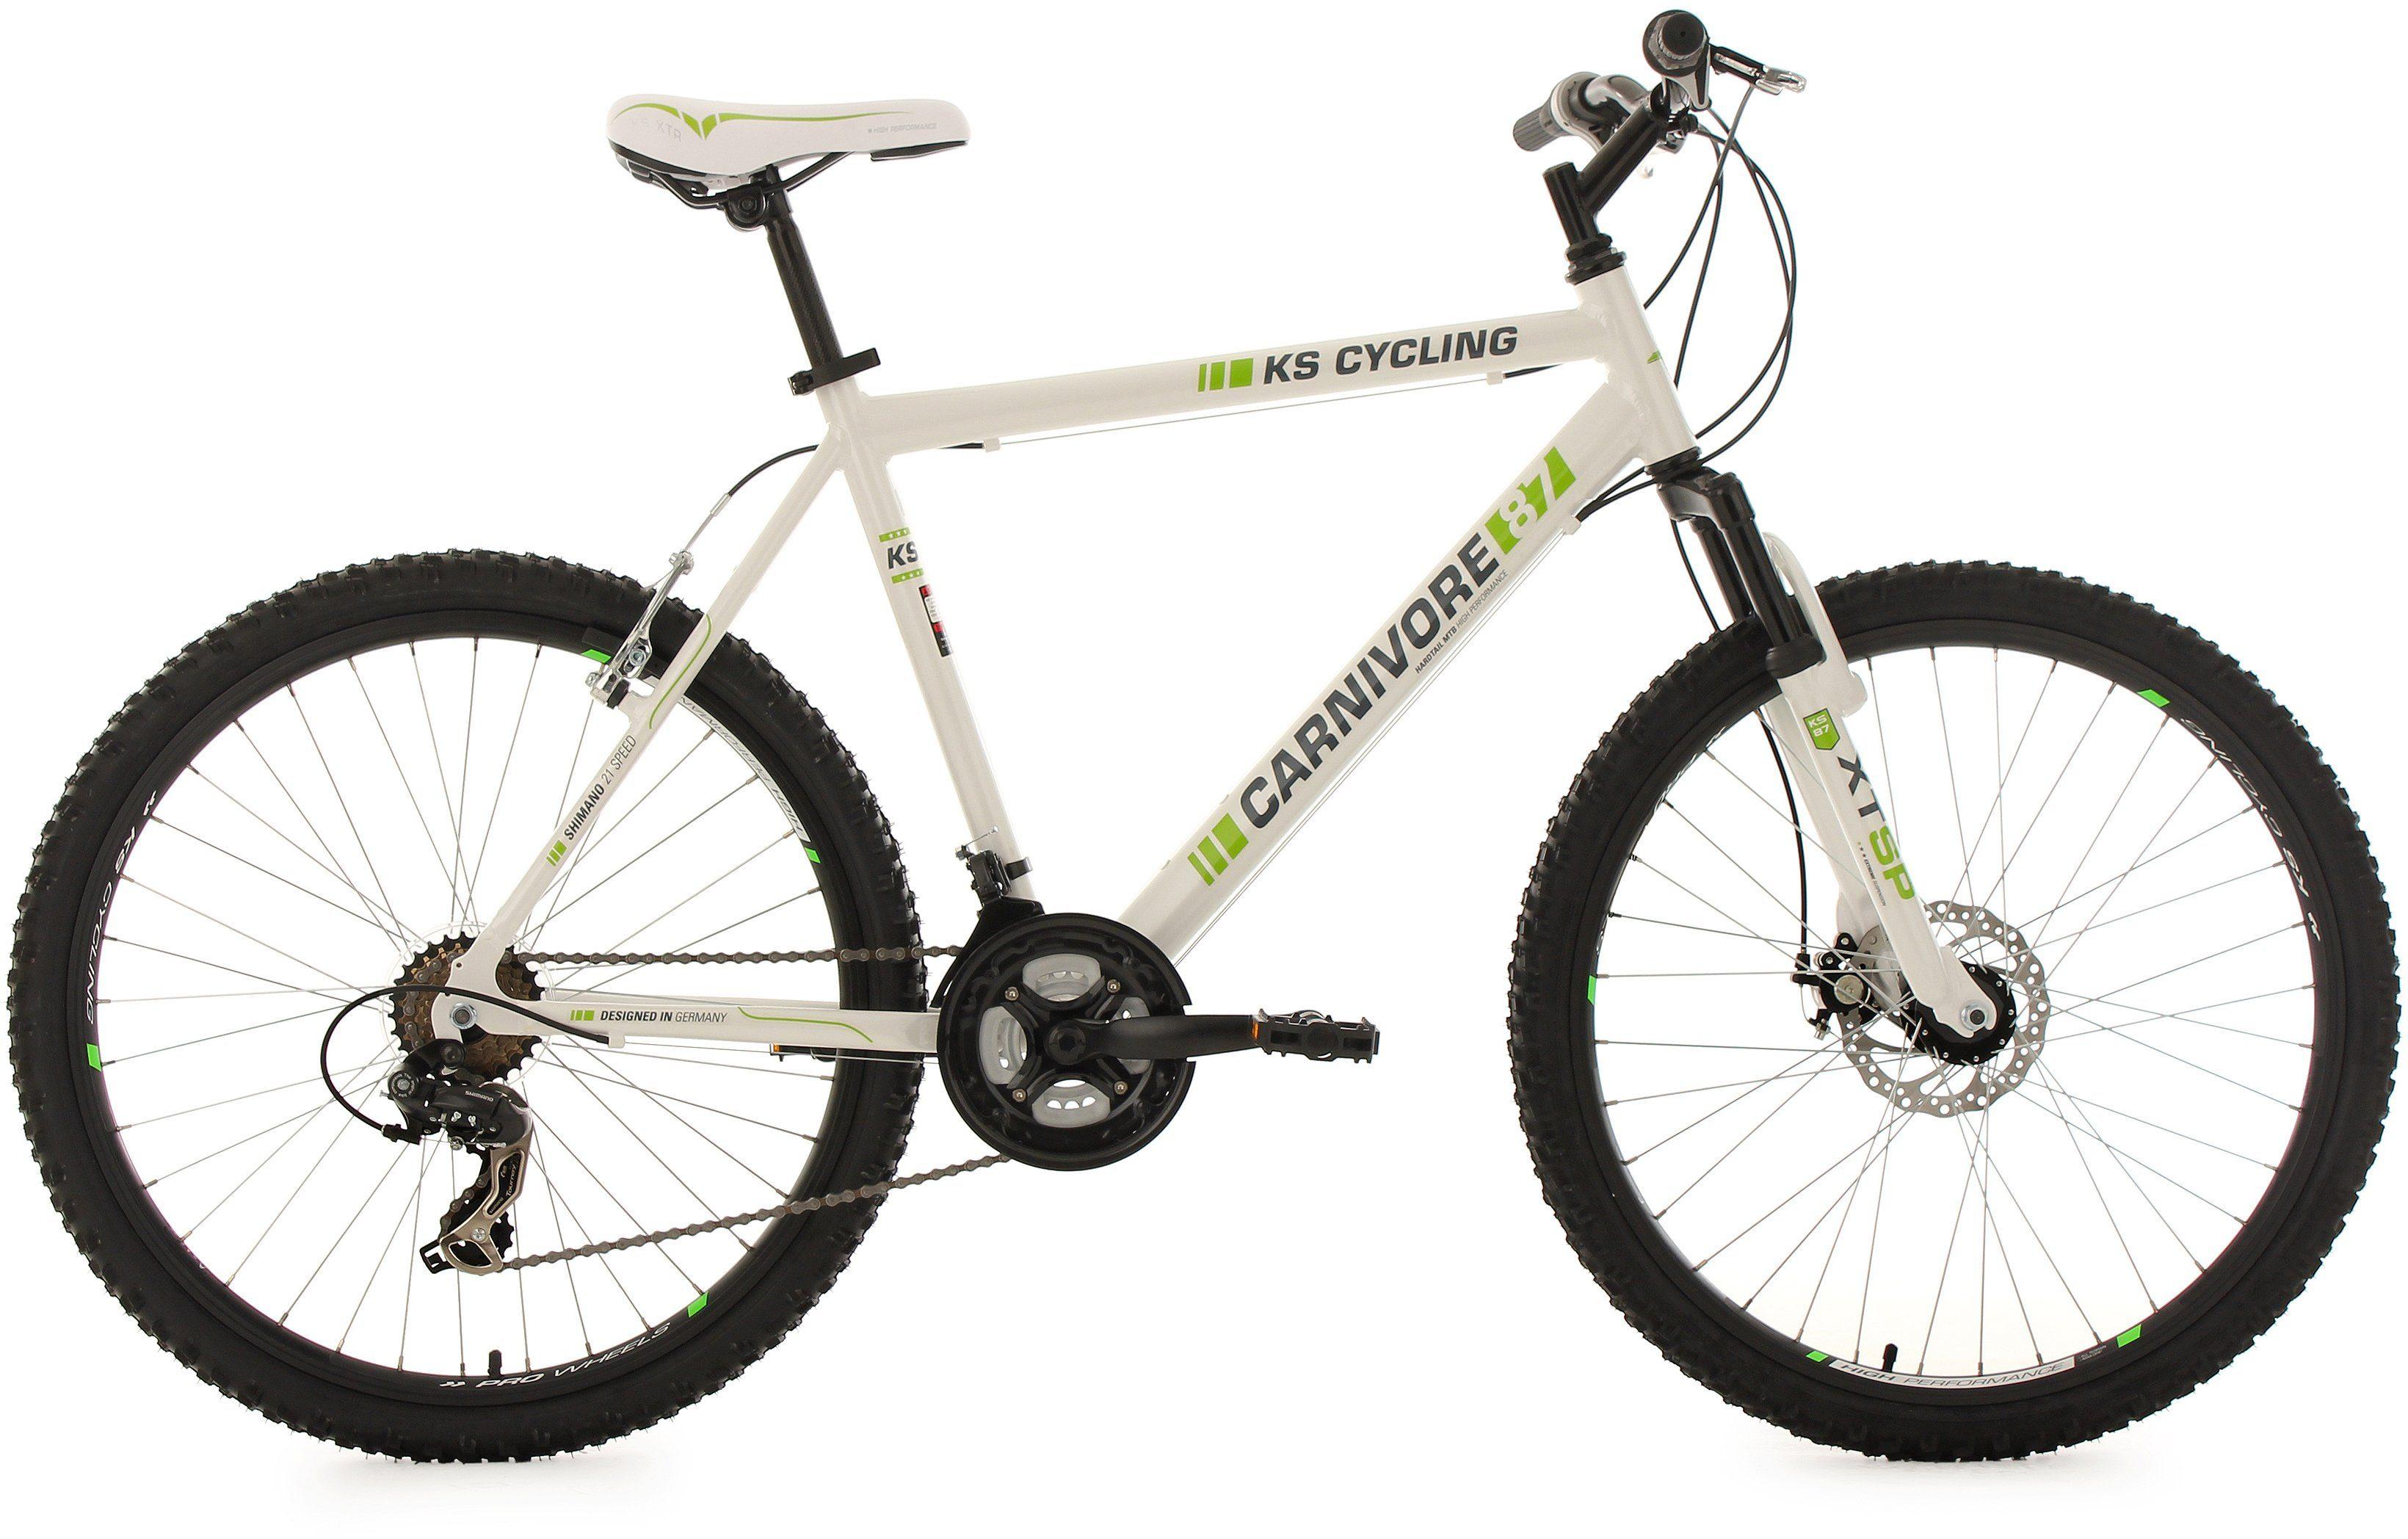 KS Cycling Hardtail-MTB, 26 Zoll, 21 Gang-Shimano Tourney Kettenschaltung, weiß-grün, »Carnivore«